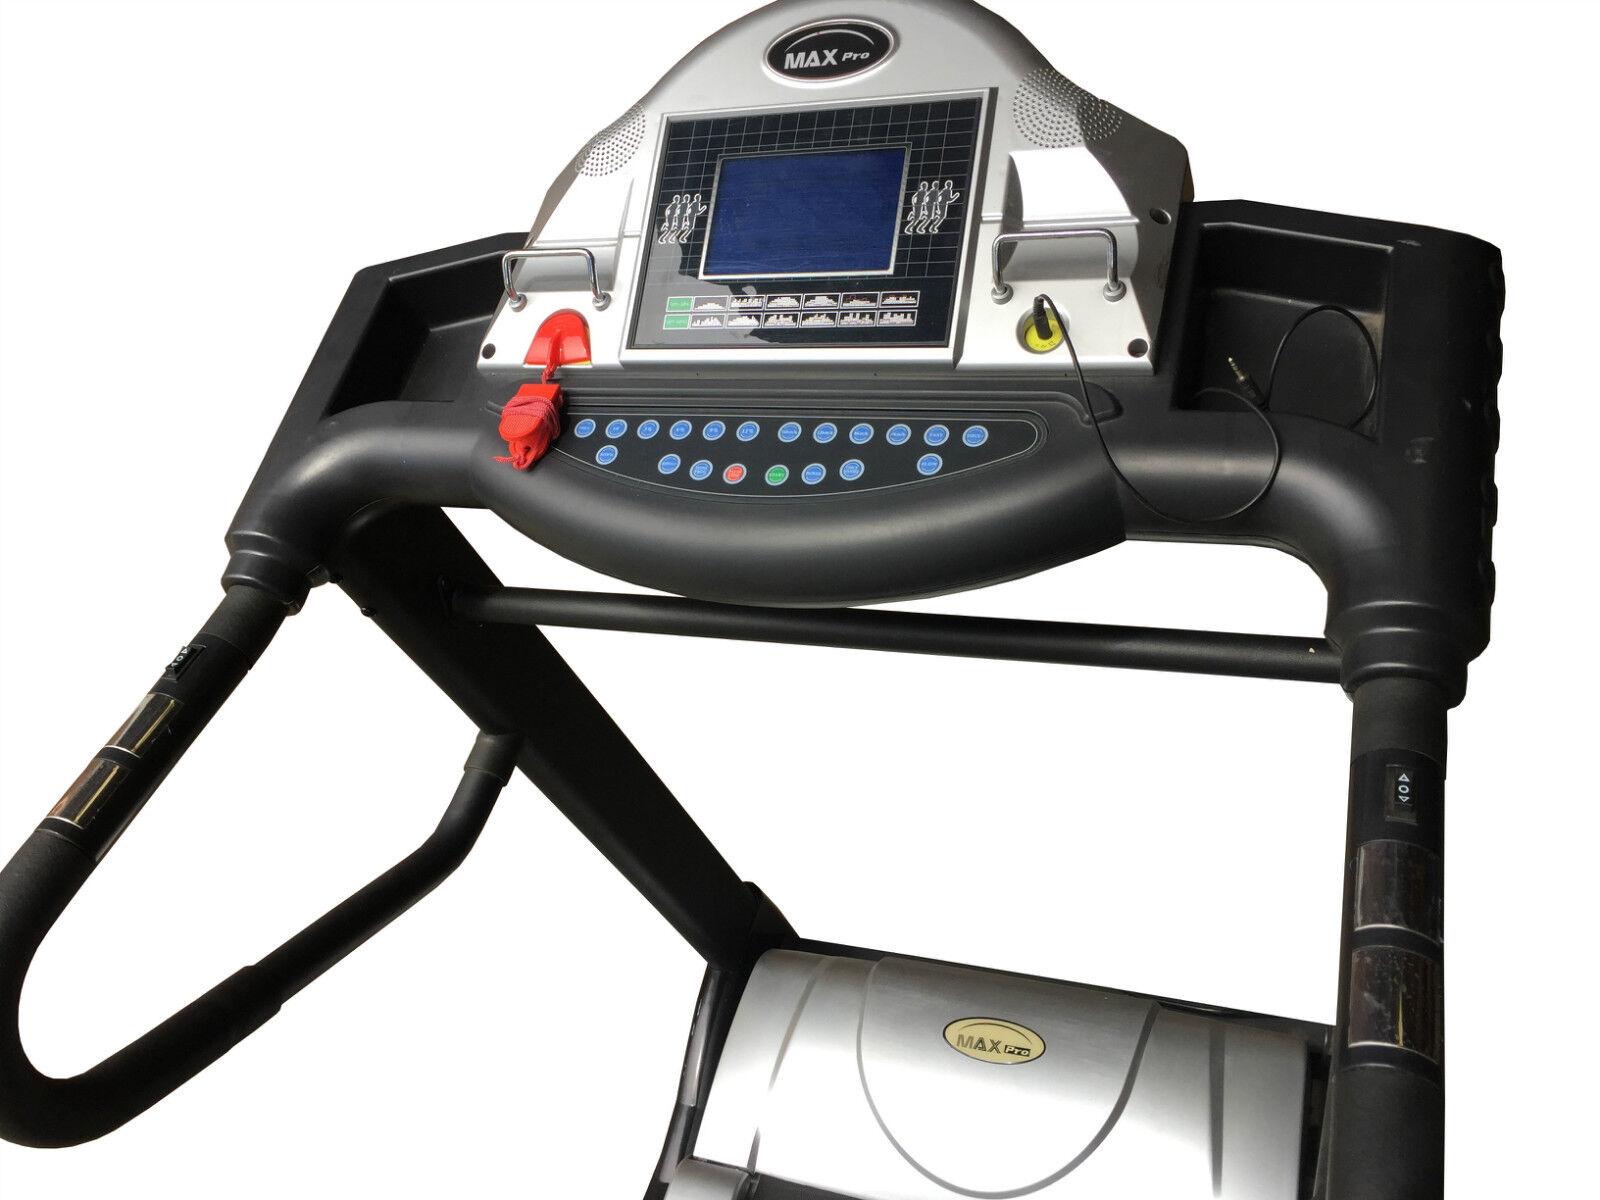 Demo treadmill 6 5hp peak motor 20 incline 510mm wide belt for Treadmill 2 5 hp motor